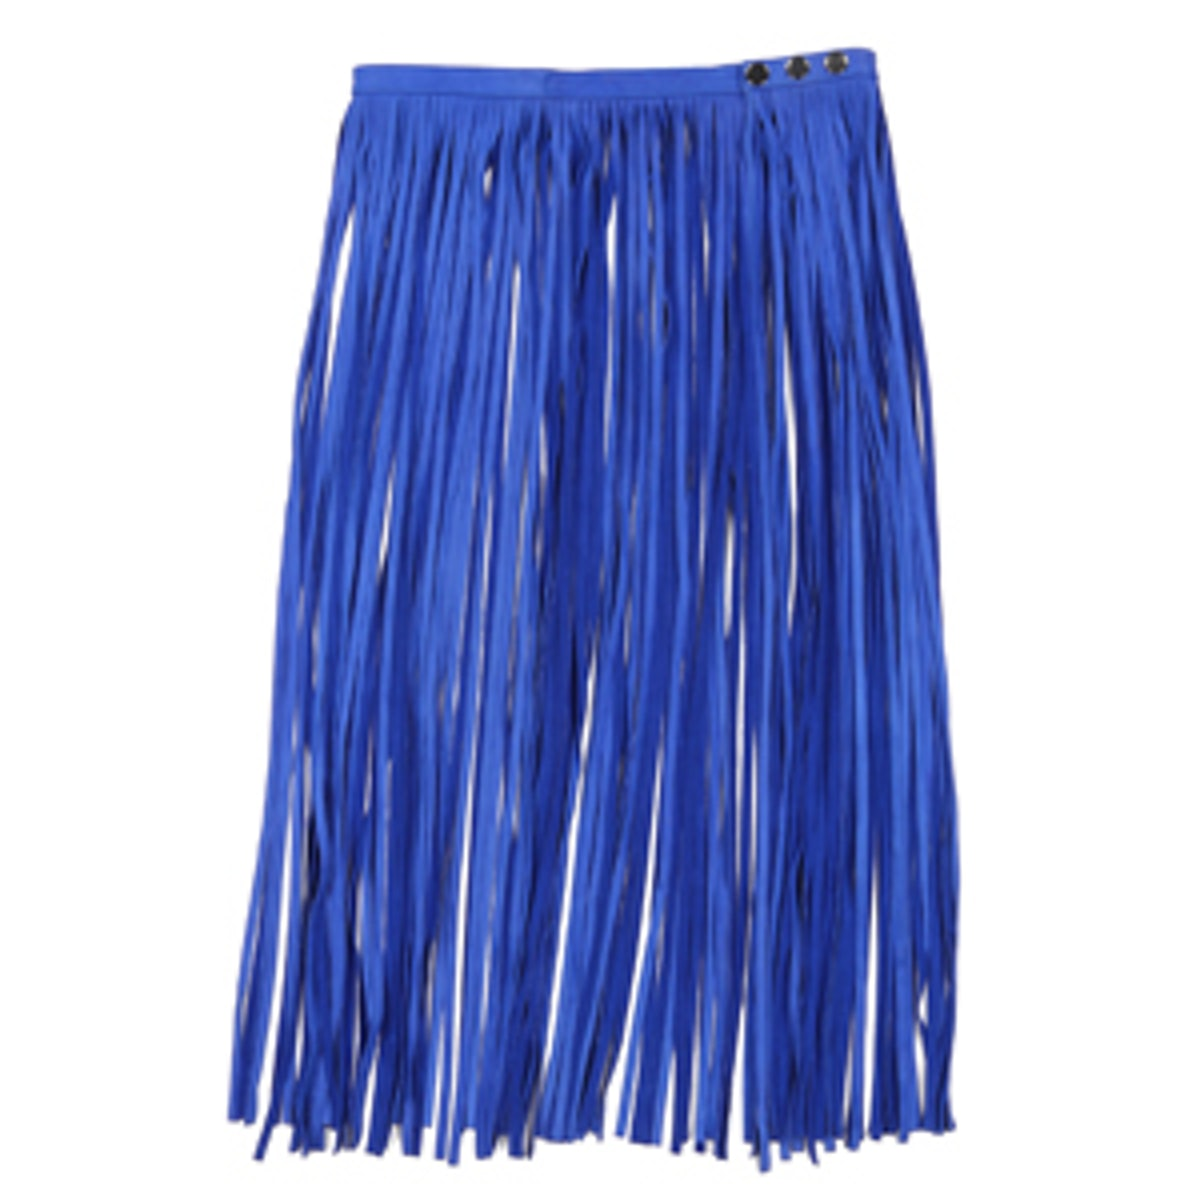 Cobalt Blue Fringe Leather Skirt